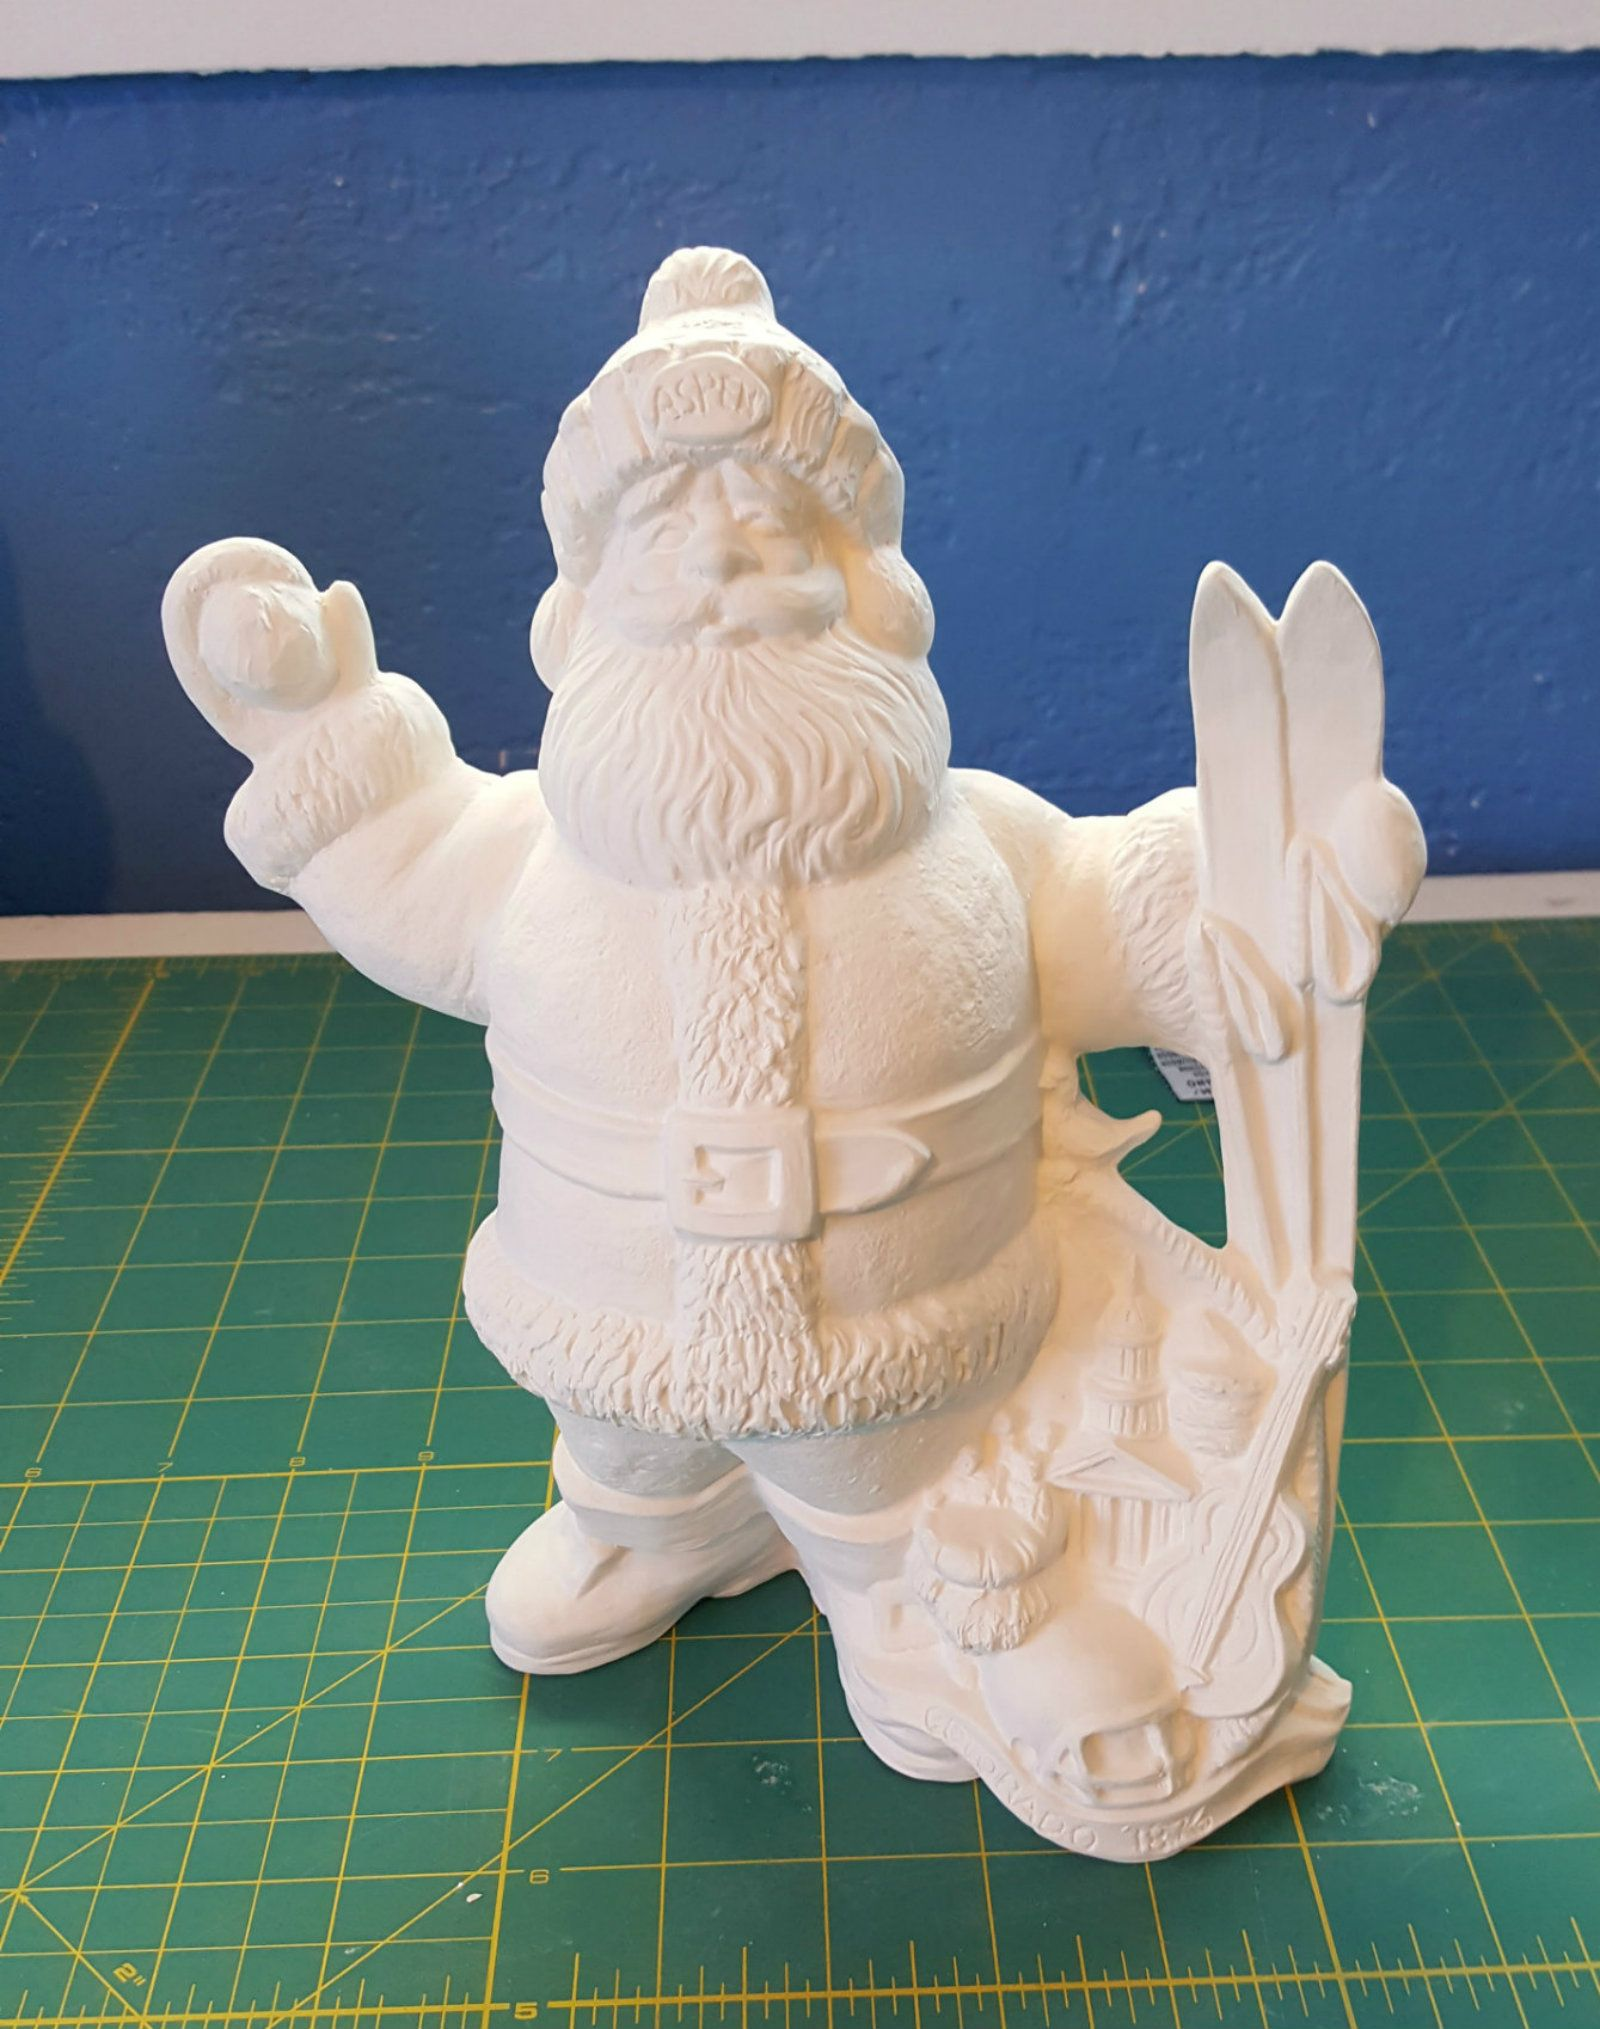 Colorado Themed State Santa Claus Ready To Paint Ceramics Ceramic Bisque Santa Claus